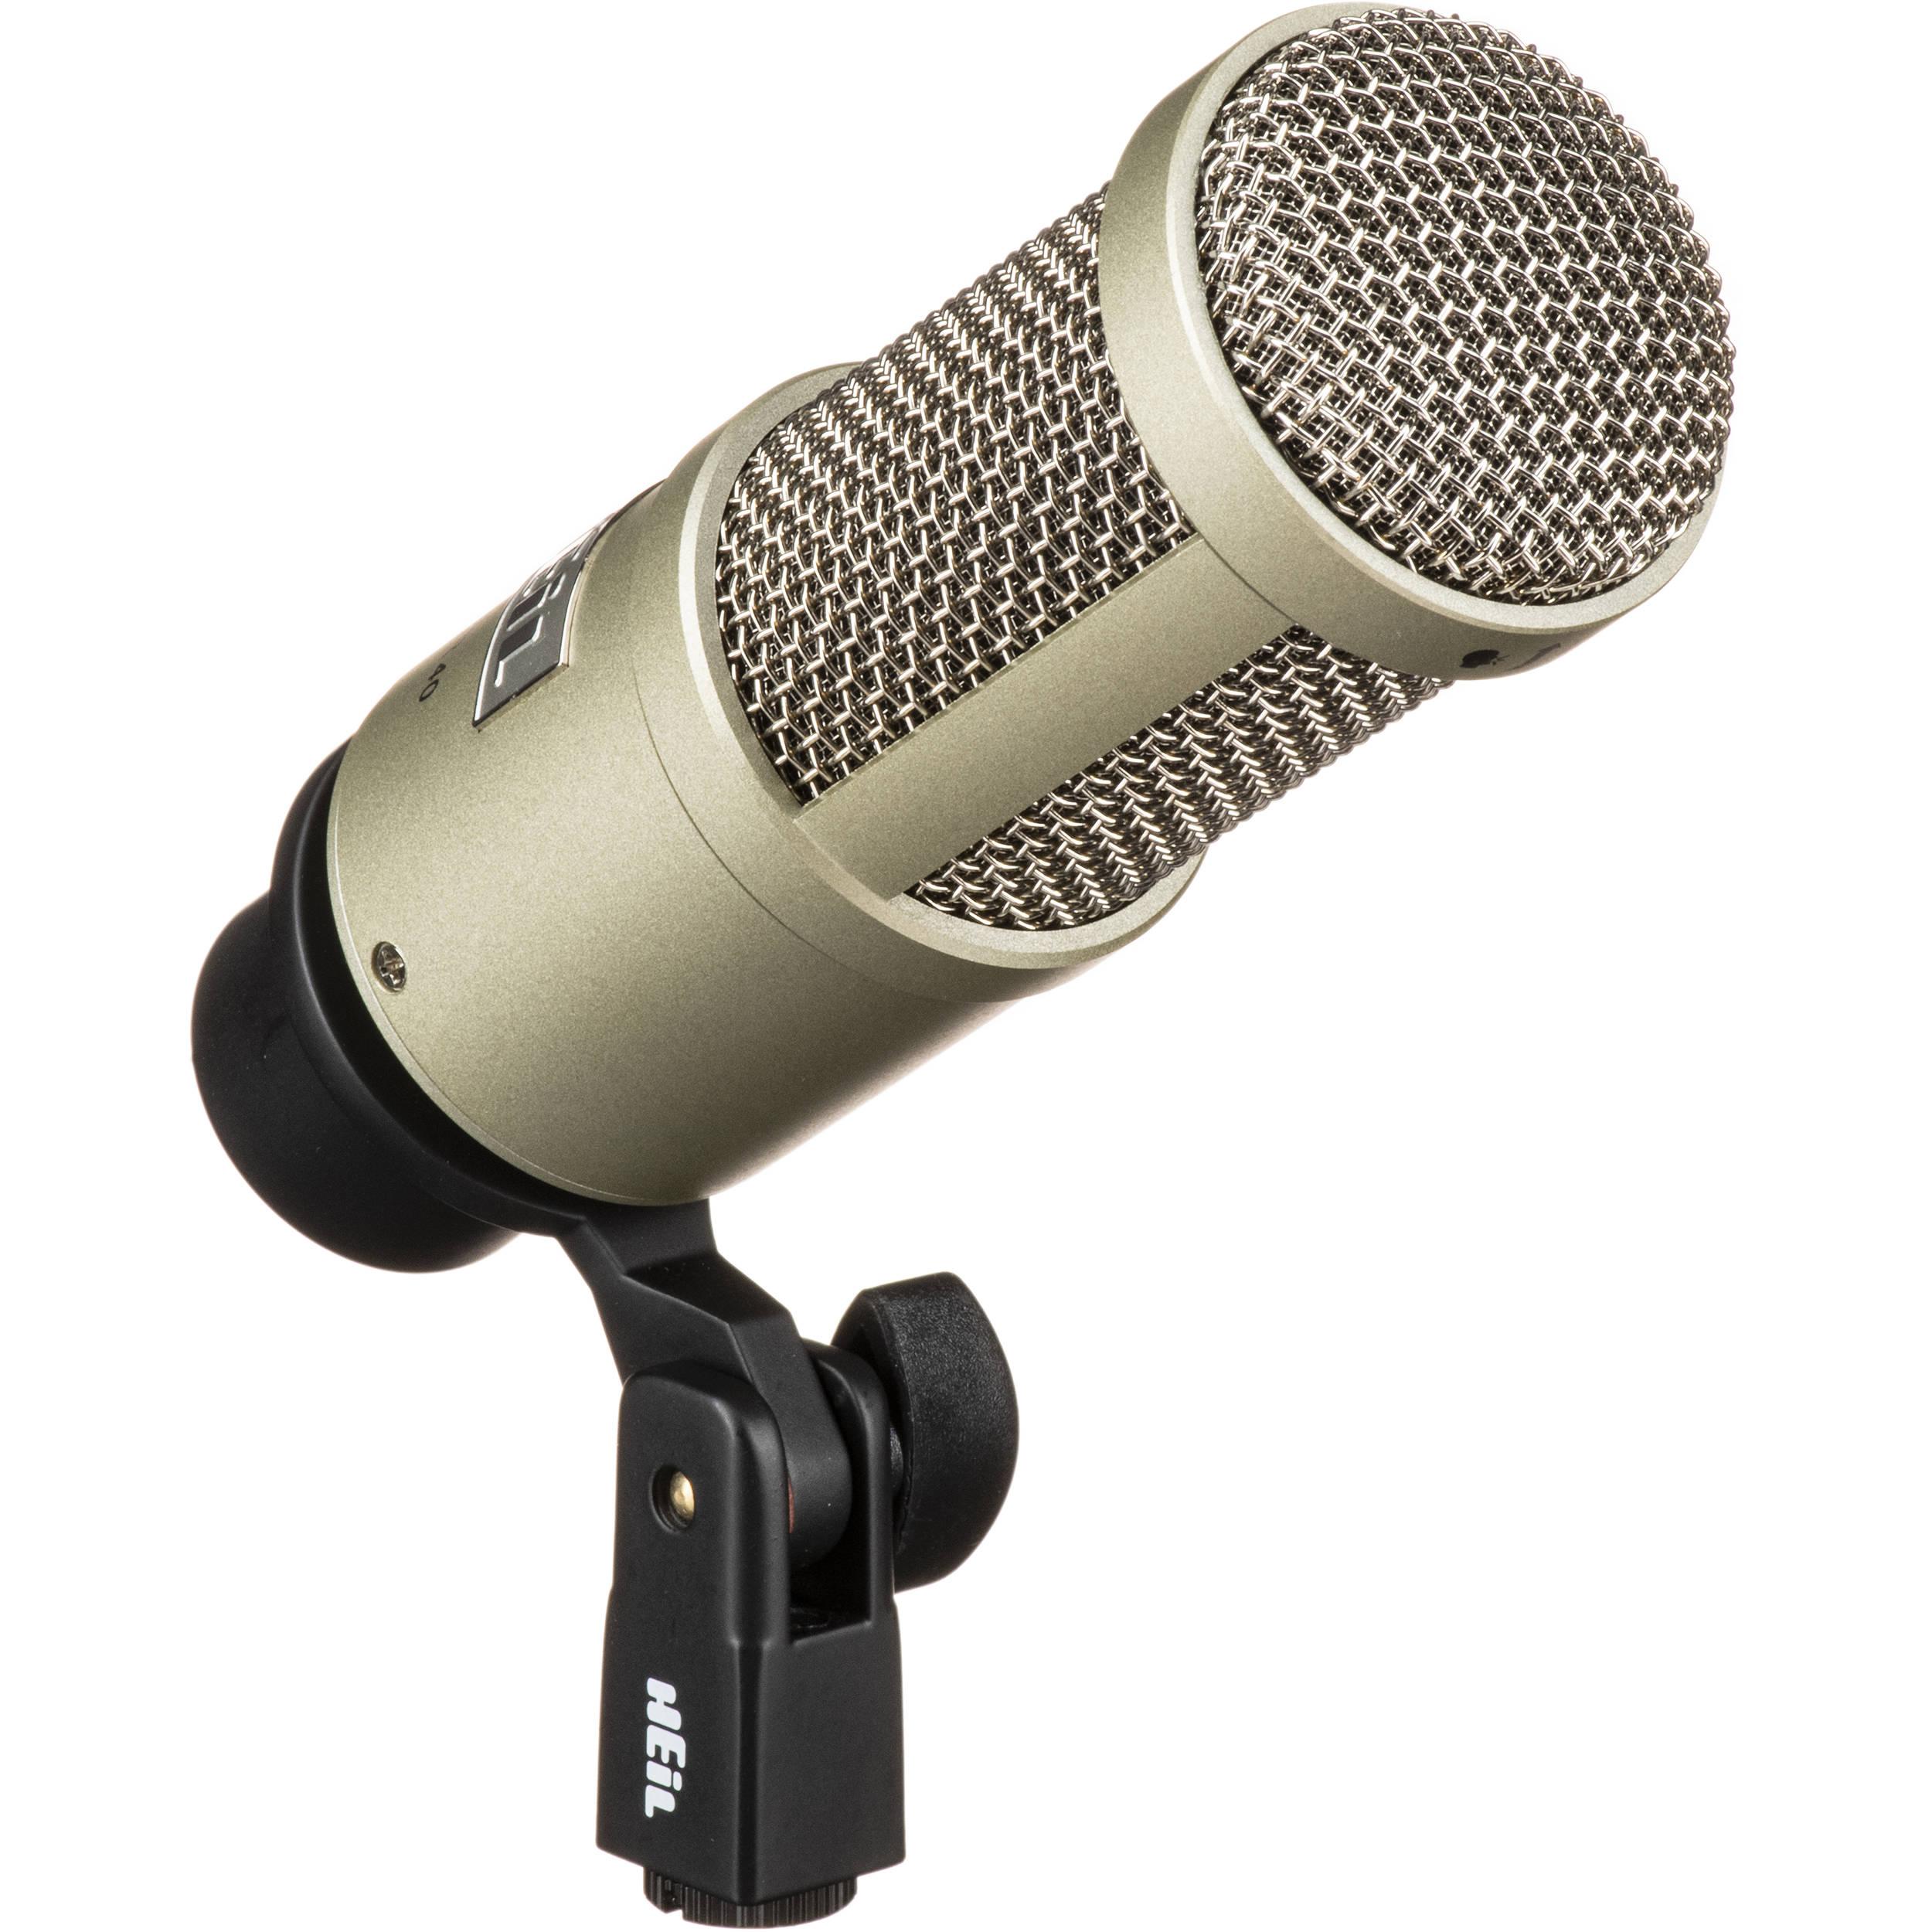 Heil sound pr 40 dynamic cardioid studio microphone pr 40 b h for Super studio